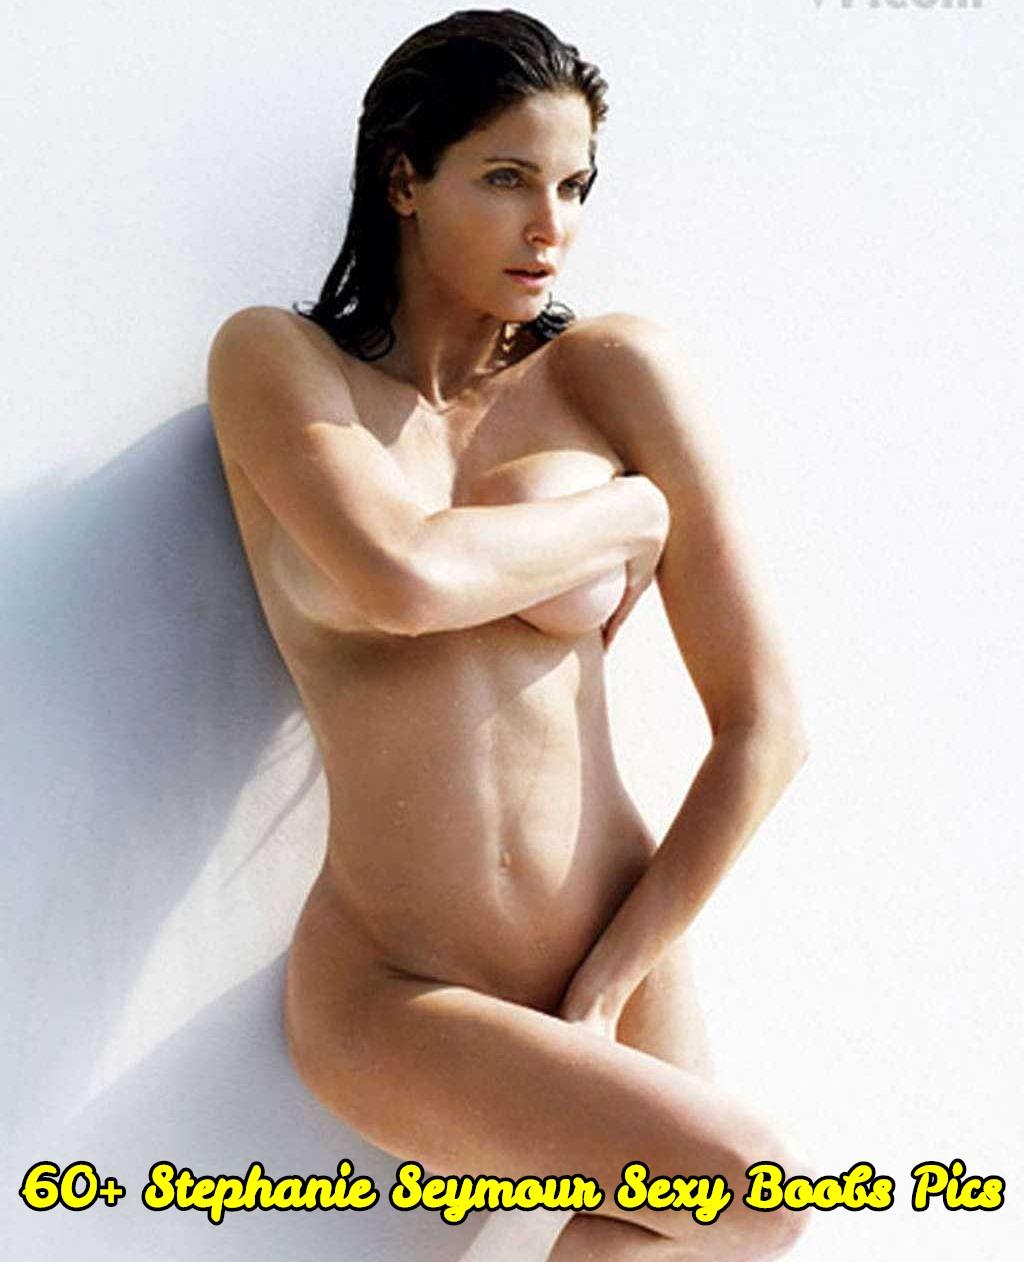 Stephanie Seymour sexy boobs pics